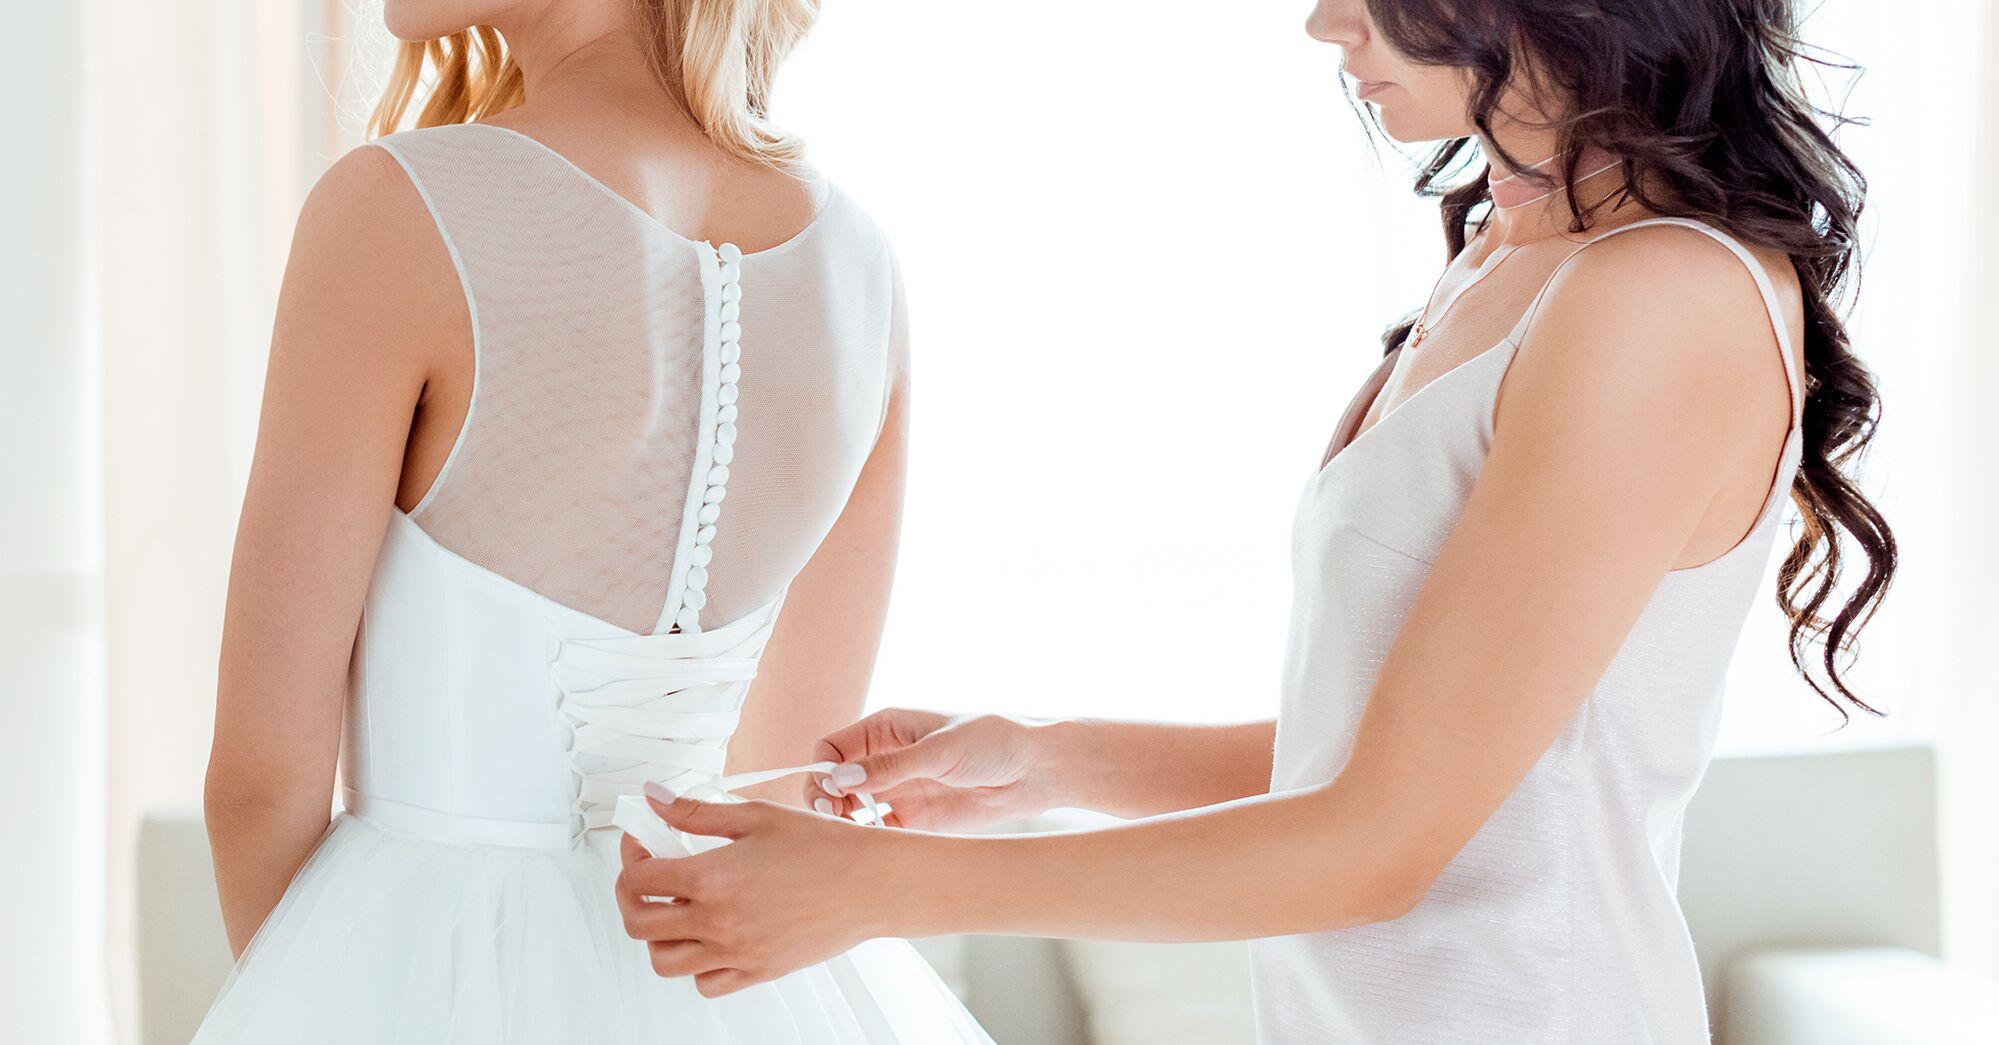 Bridal shapewear and undergarments under the wedding for Under wedding dress shapewear